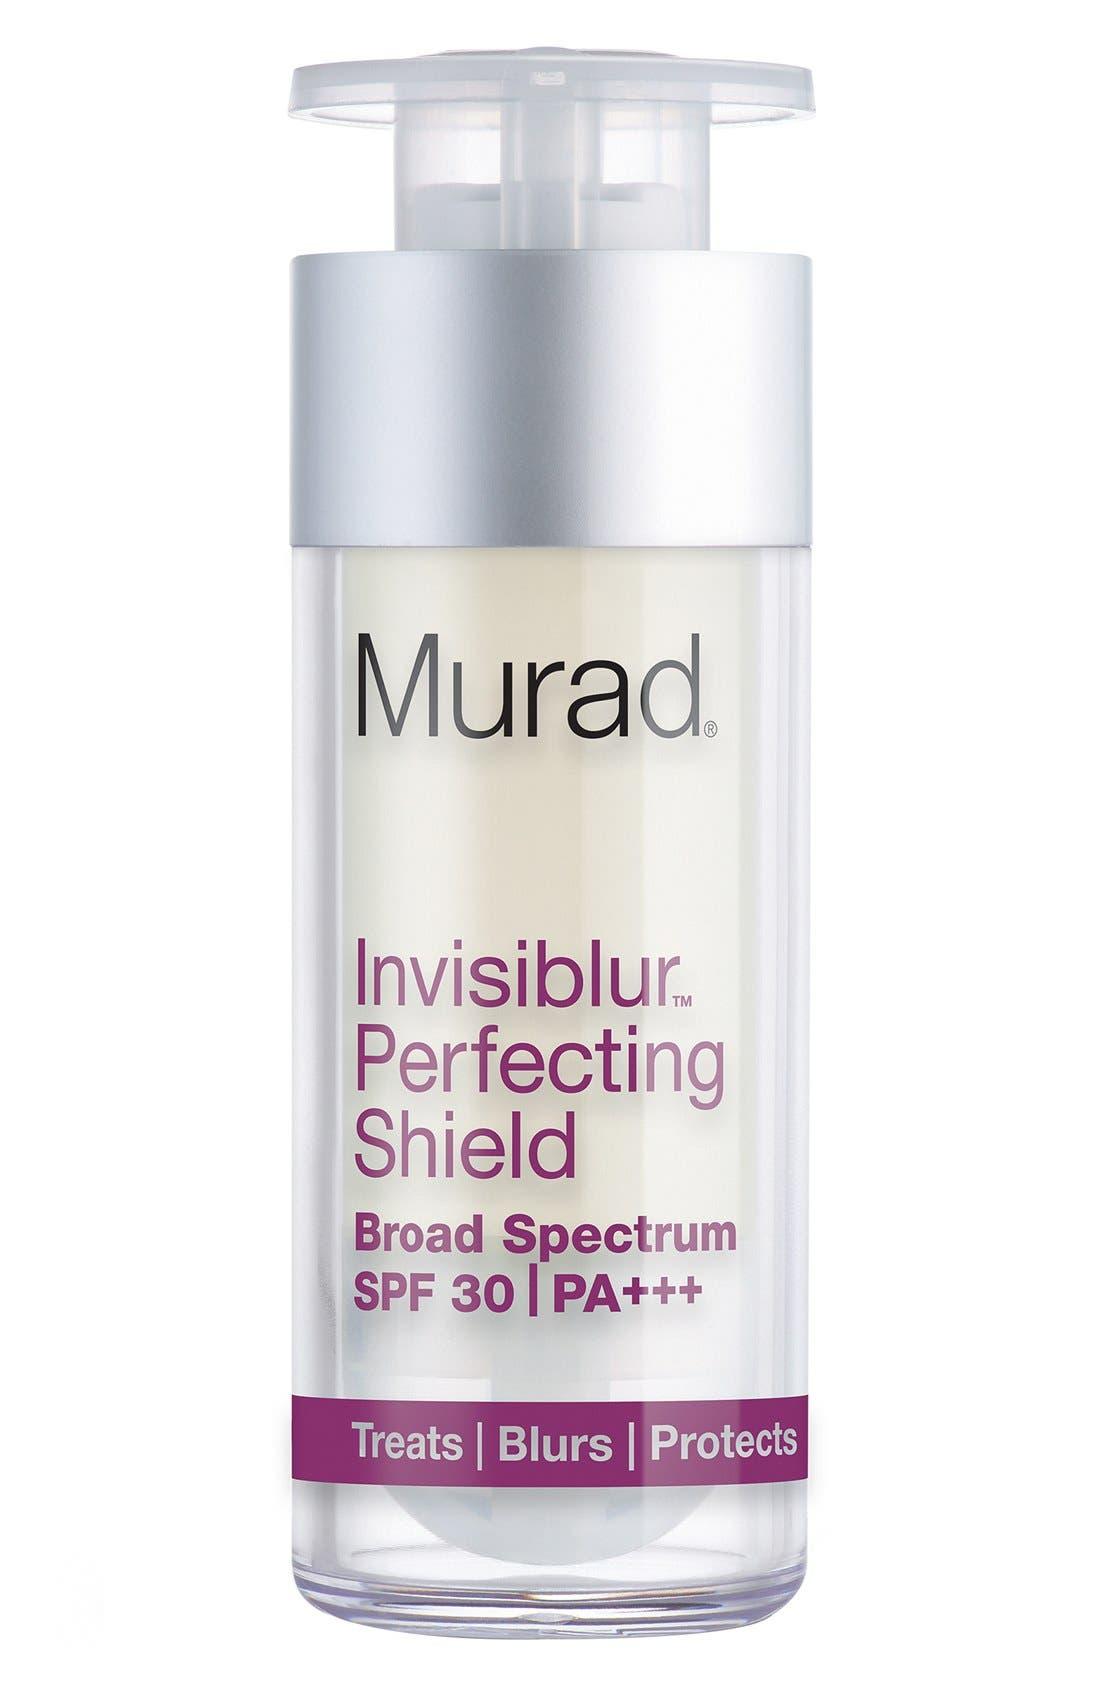 Murad® 'Invisiblur™' Perfecting Shield Broad Spectrum SPF 30 PA+++